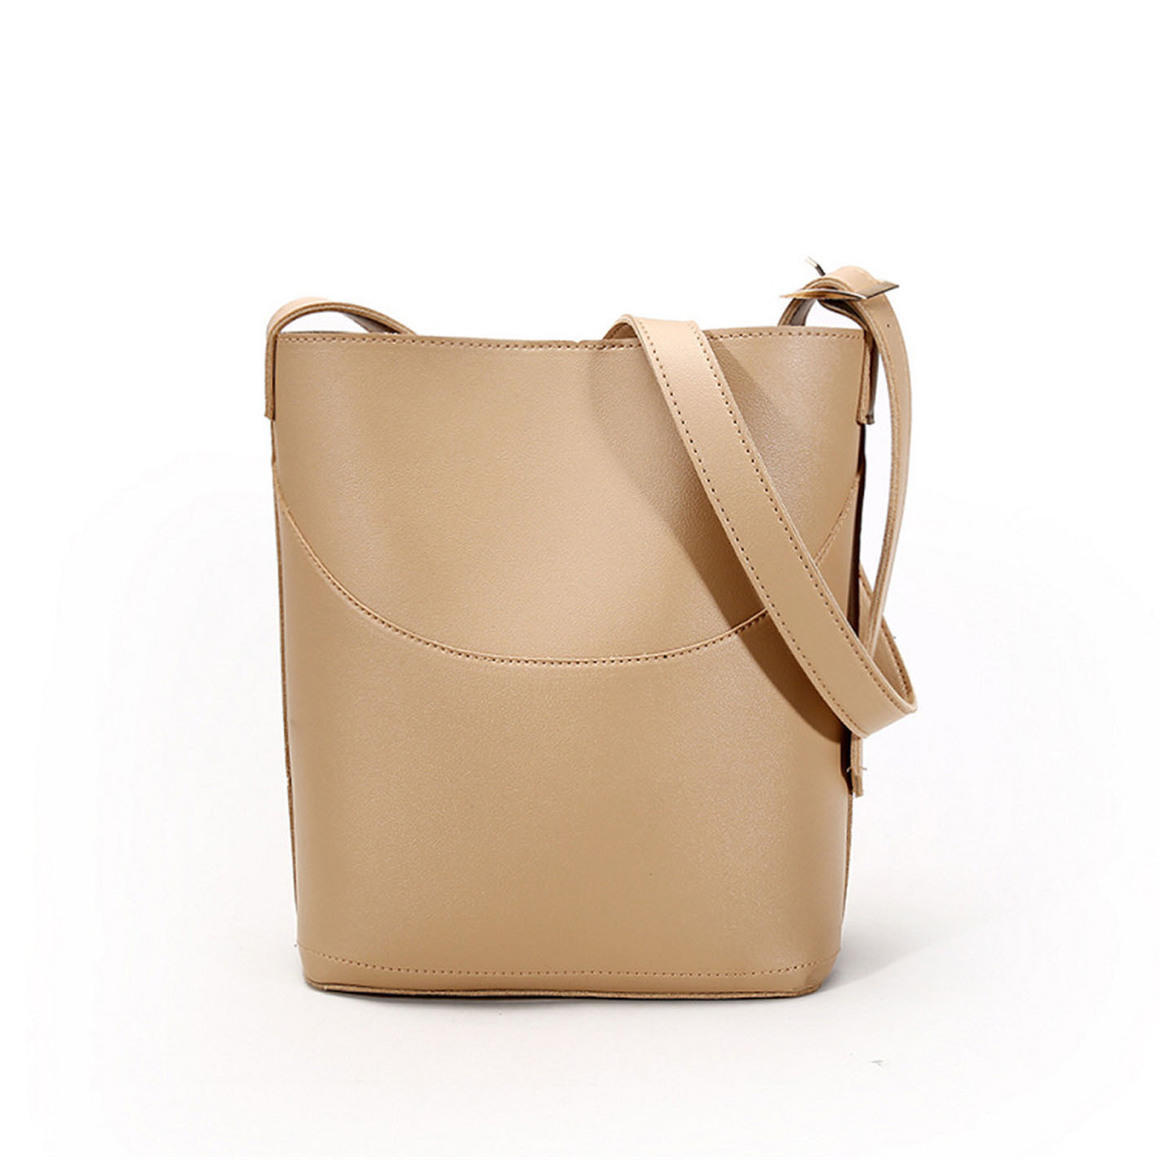 THSB1015: Beige:  Eva Bucket Tote Bag | Trada Marketplace